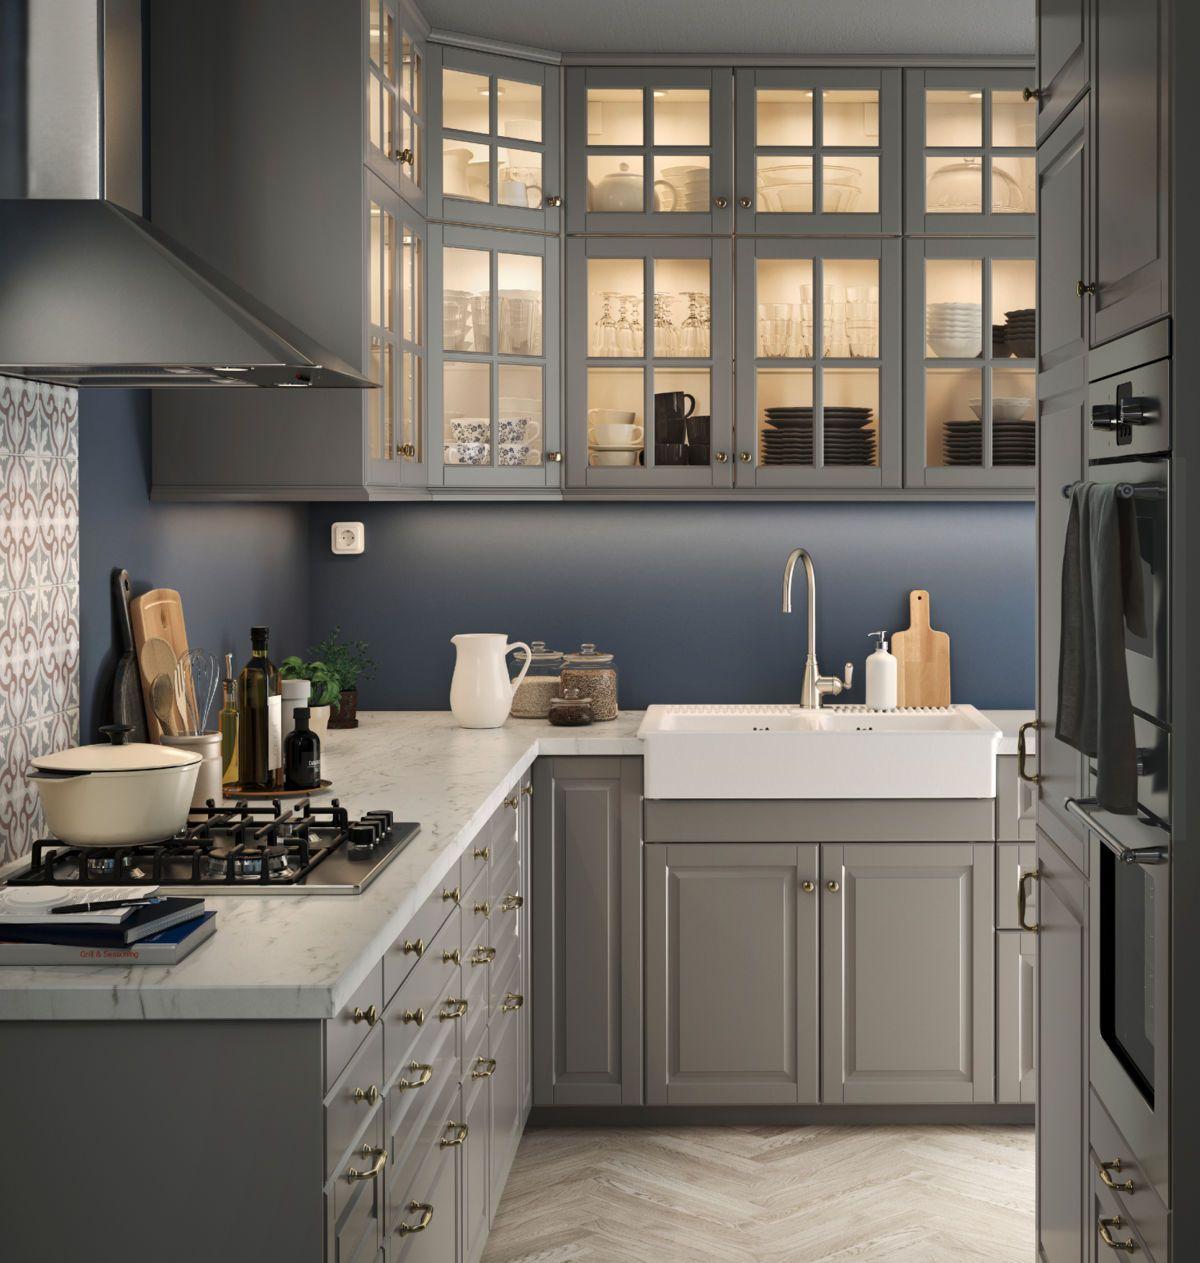 Cat logo cocinas 2017 cocina gris y azul kasa for Kasa diseno interior